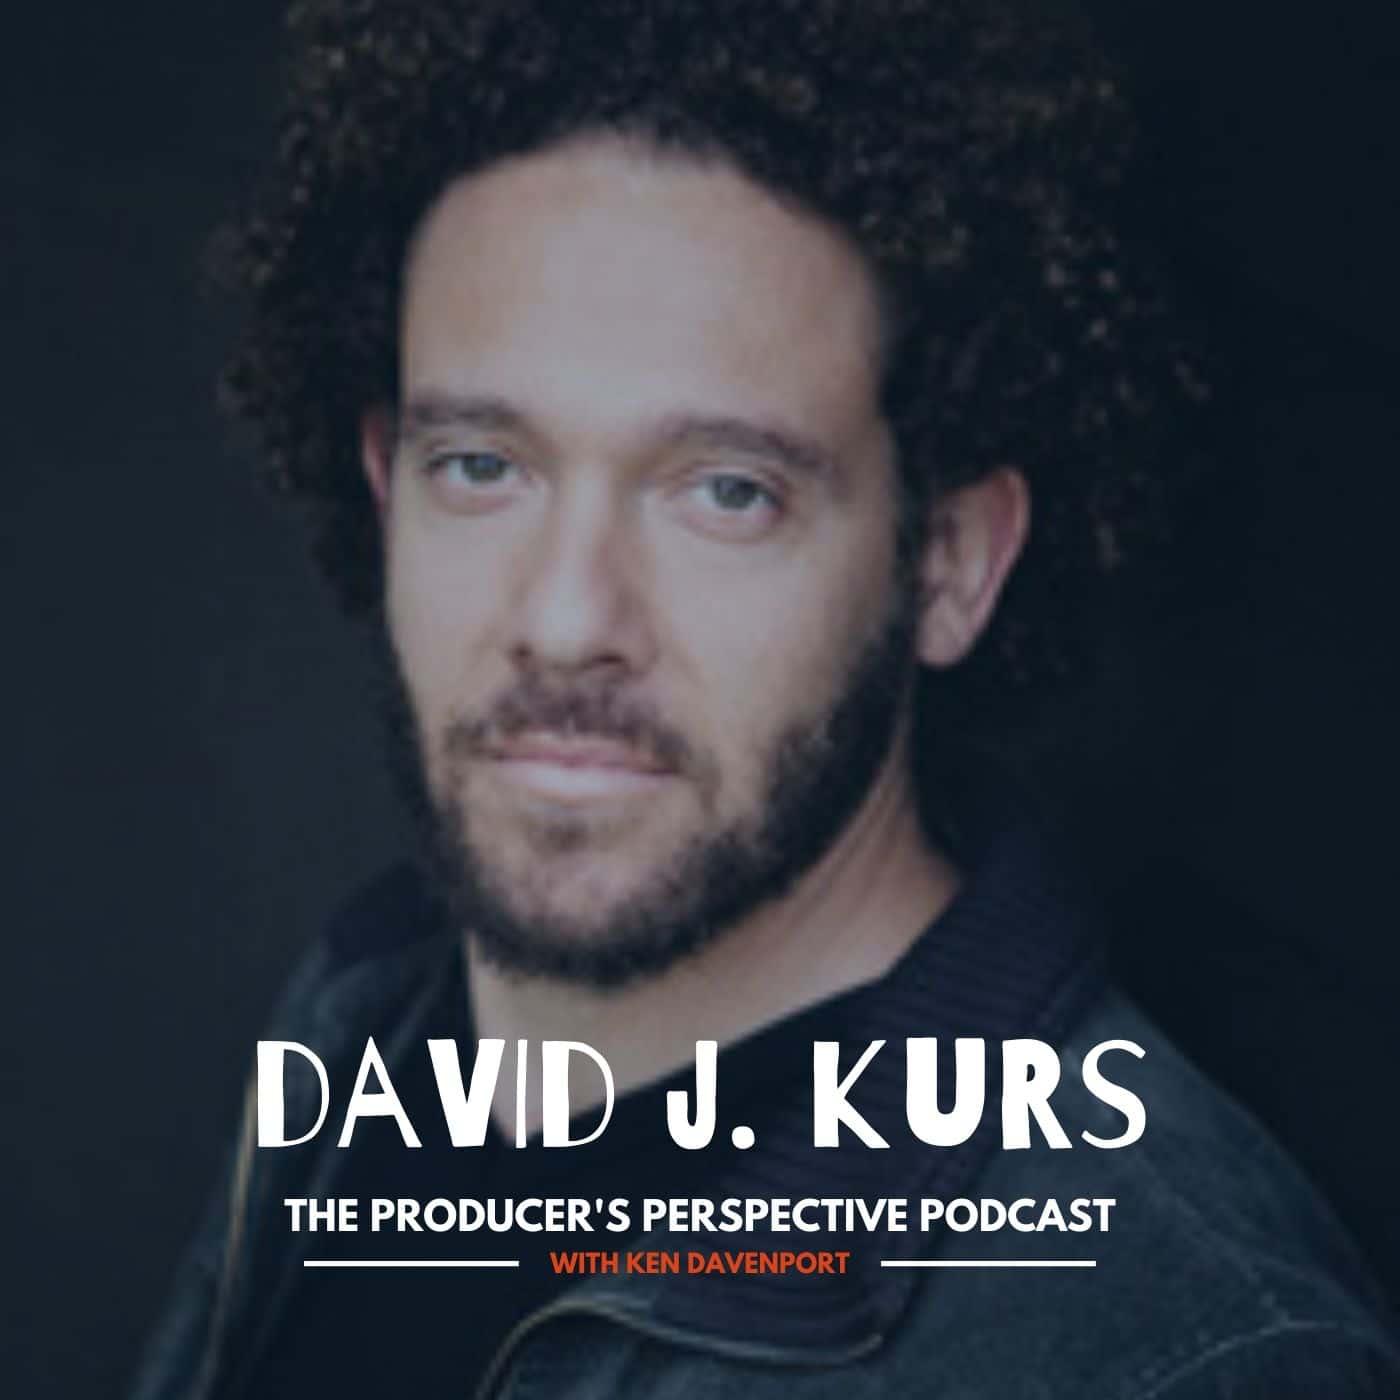 Ken Davenport's The Producer's Perspective Podcast Episode 40 - David J. Kurs